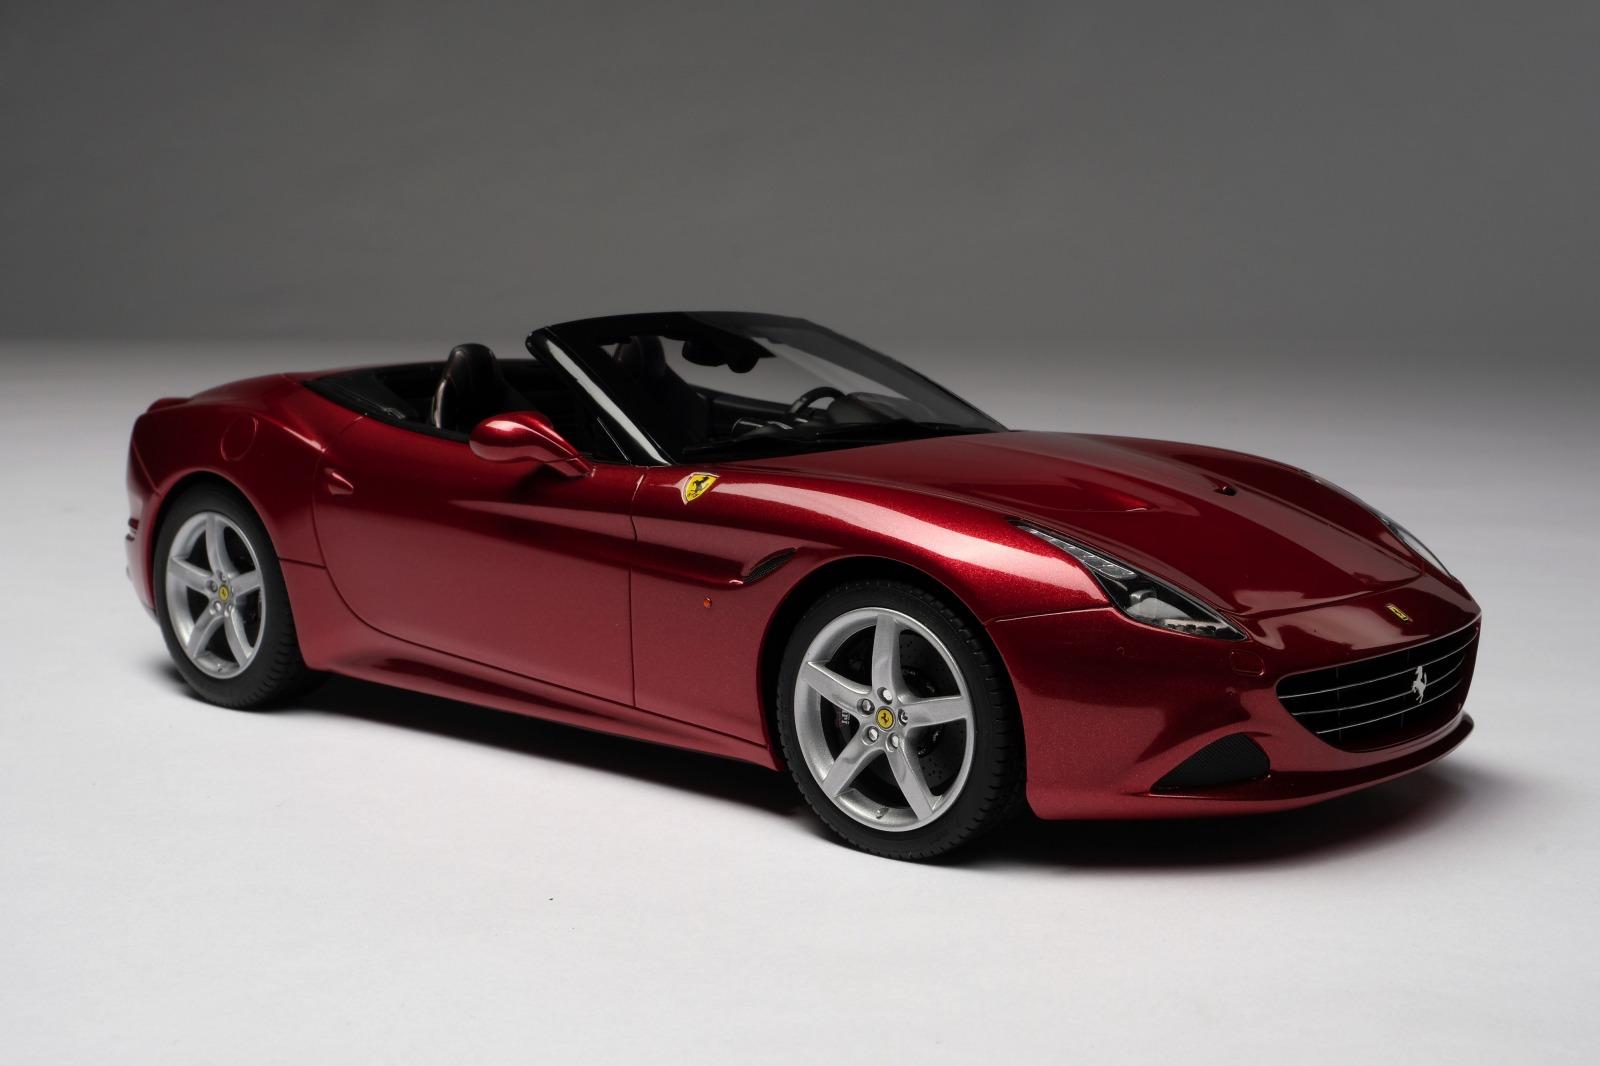 Amalgam Colleciton 2015年モデル フェラーリ カリフォルニア T Rosso Mugello レッド2015 Ferrari California T 1/18 Rosso Mugello red by Amalgam Collection NEW